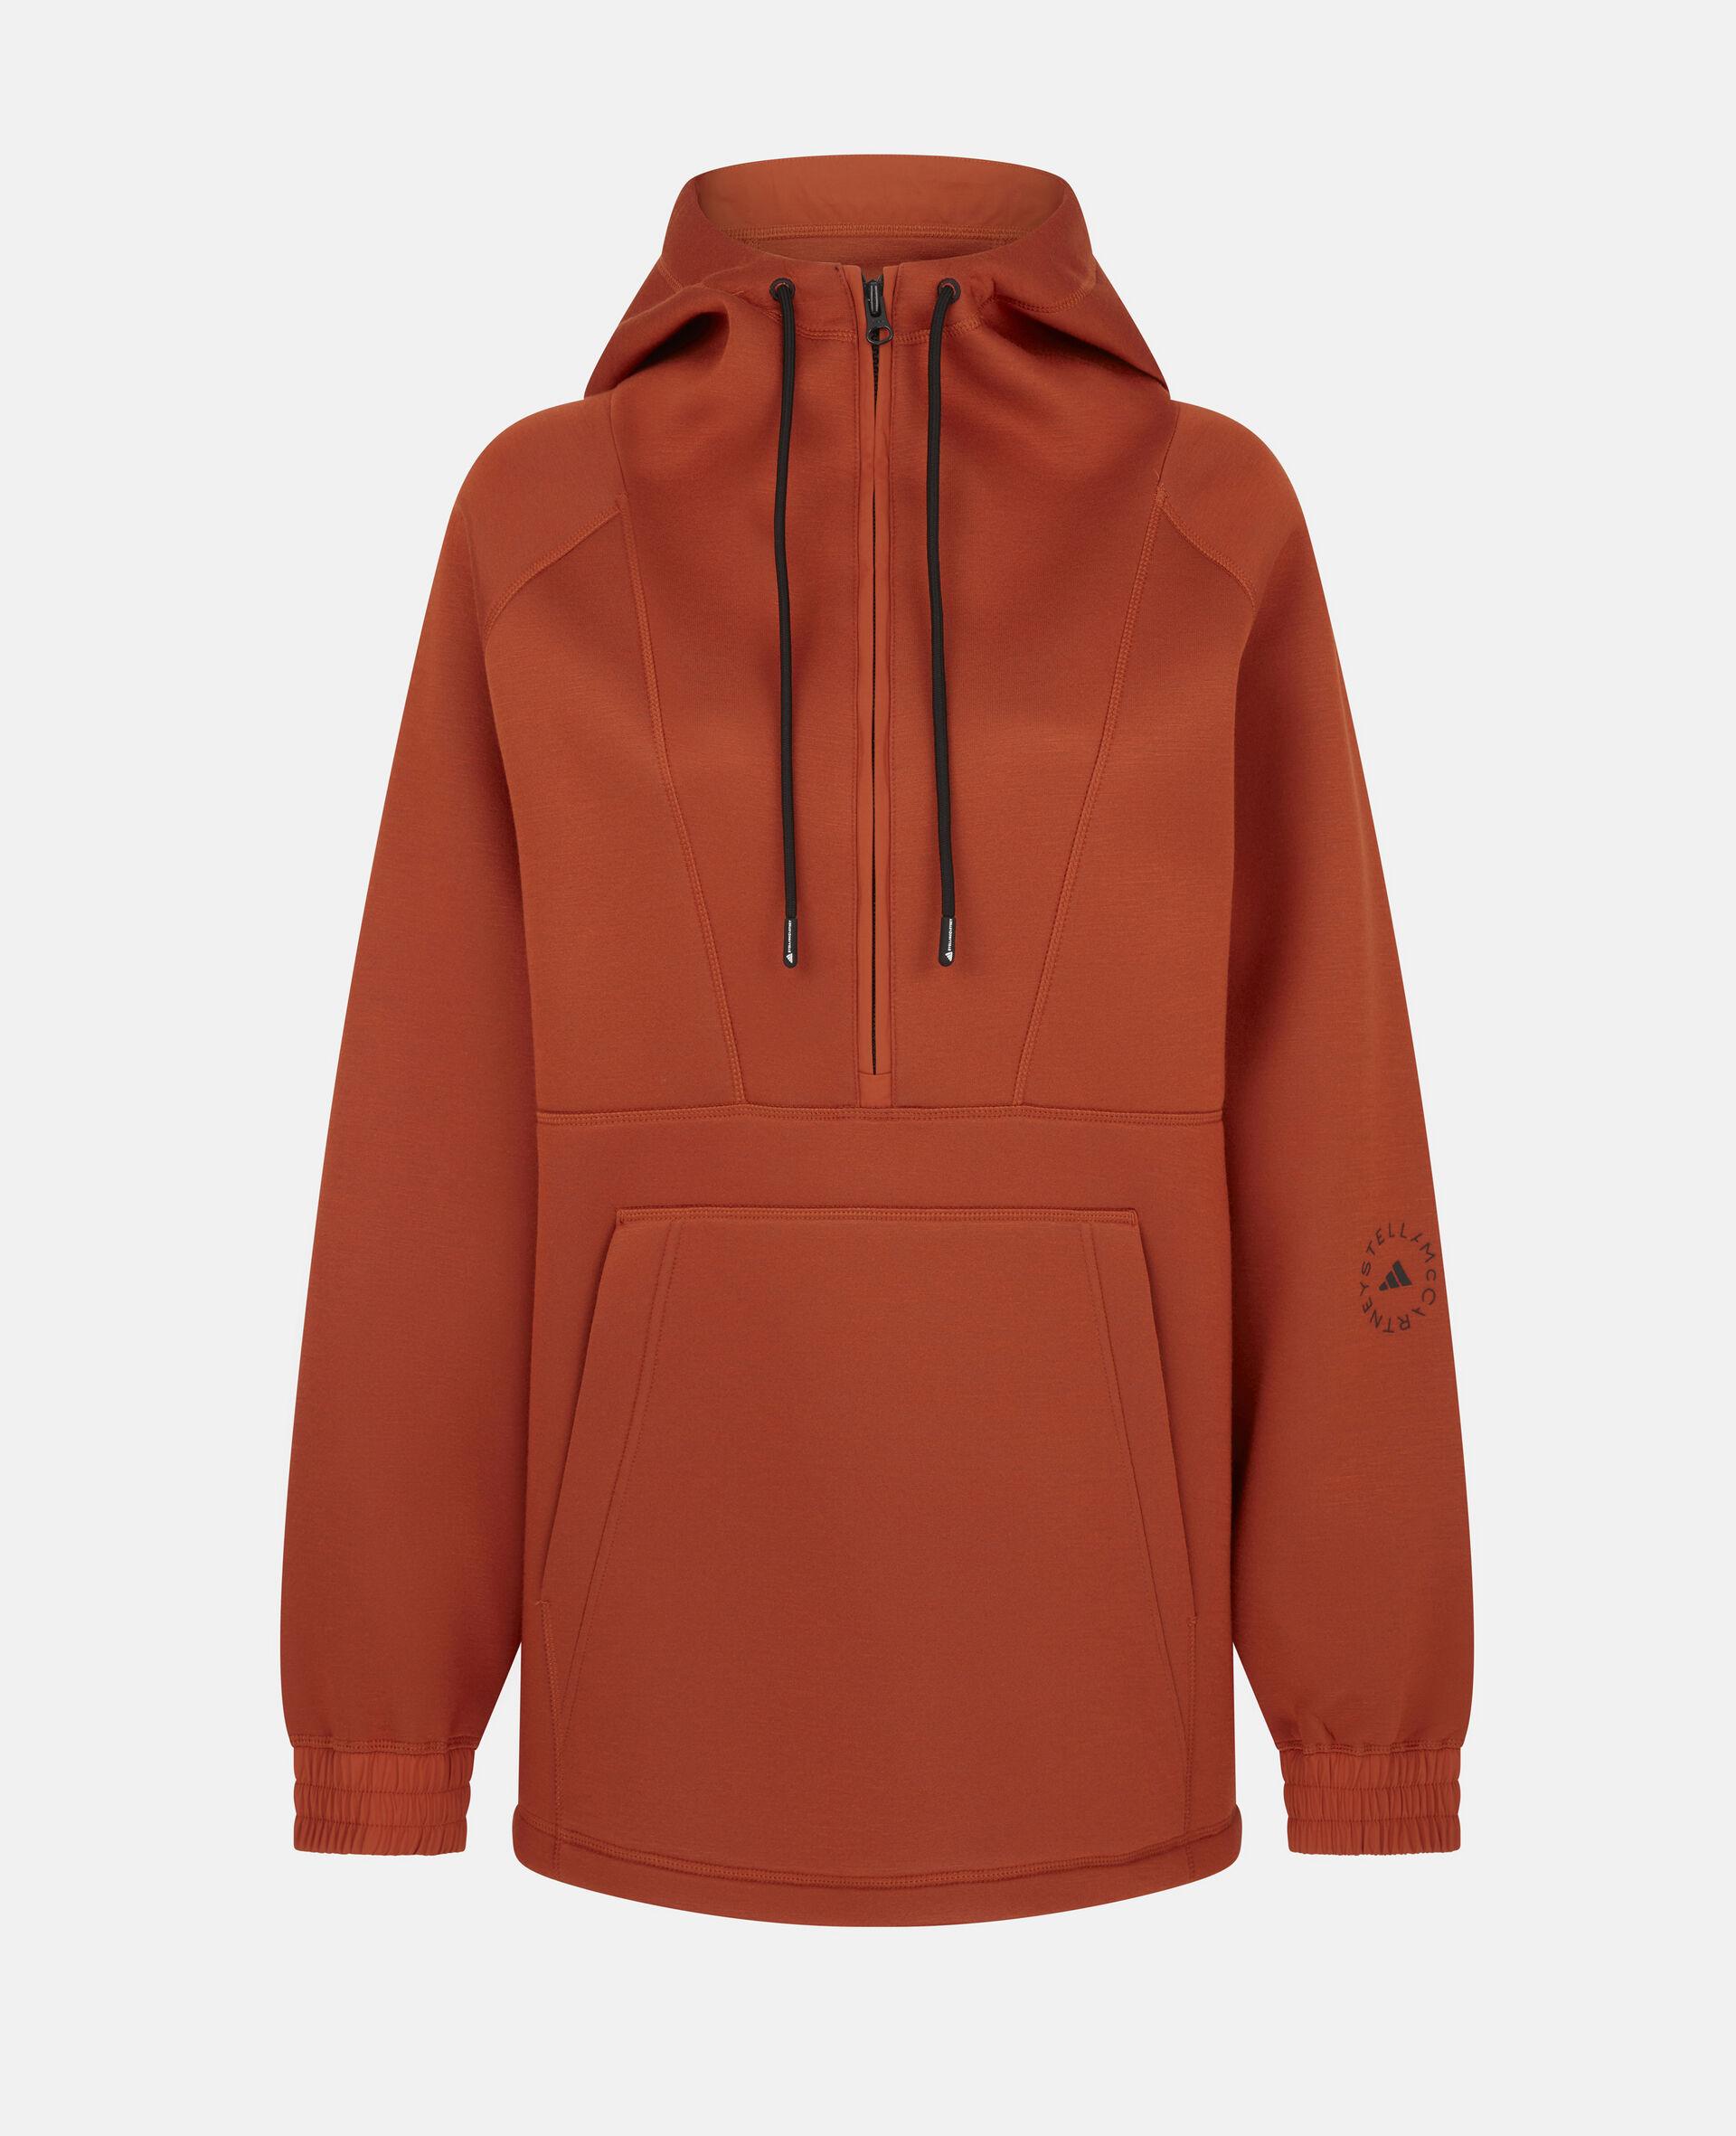 Sweat de sport à capuche orange-Orange-large image number 0